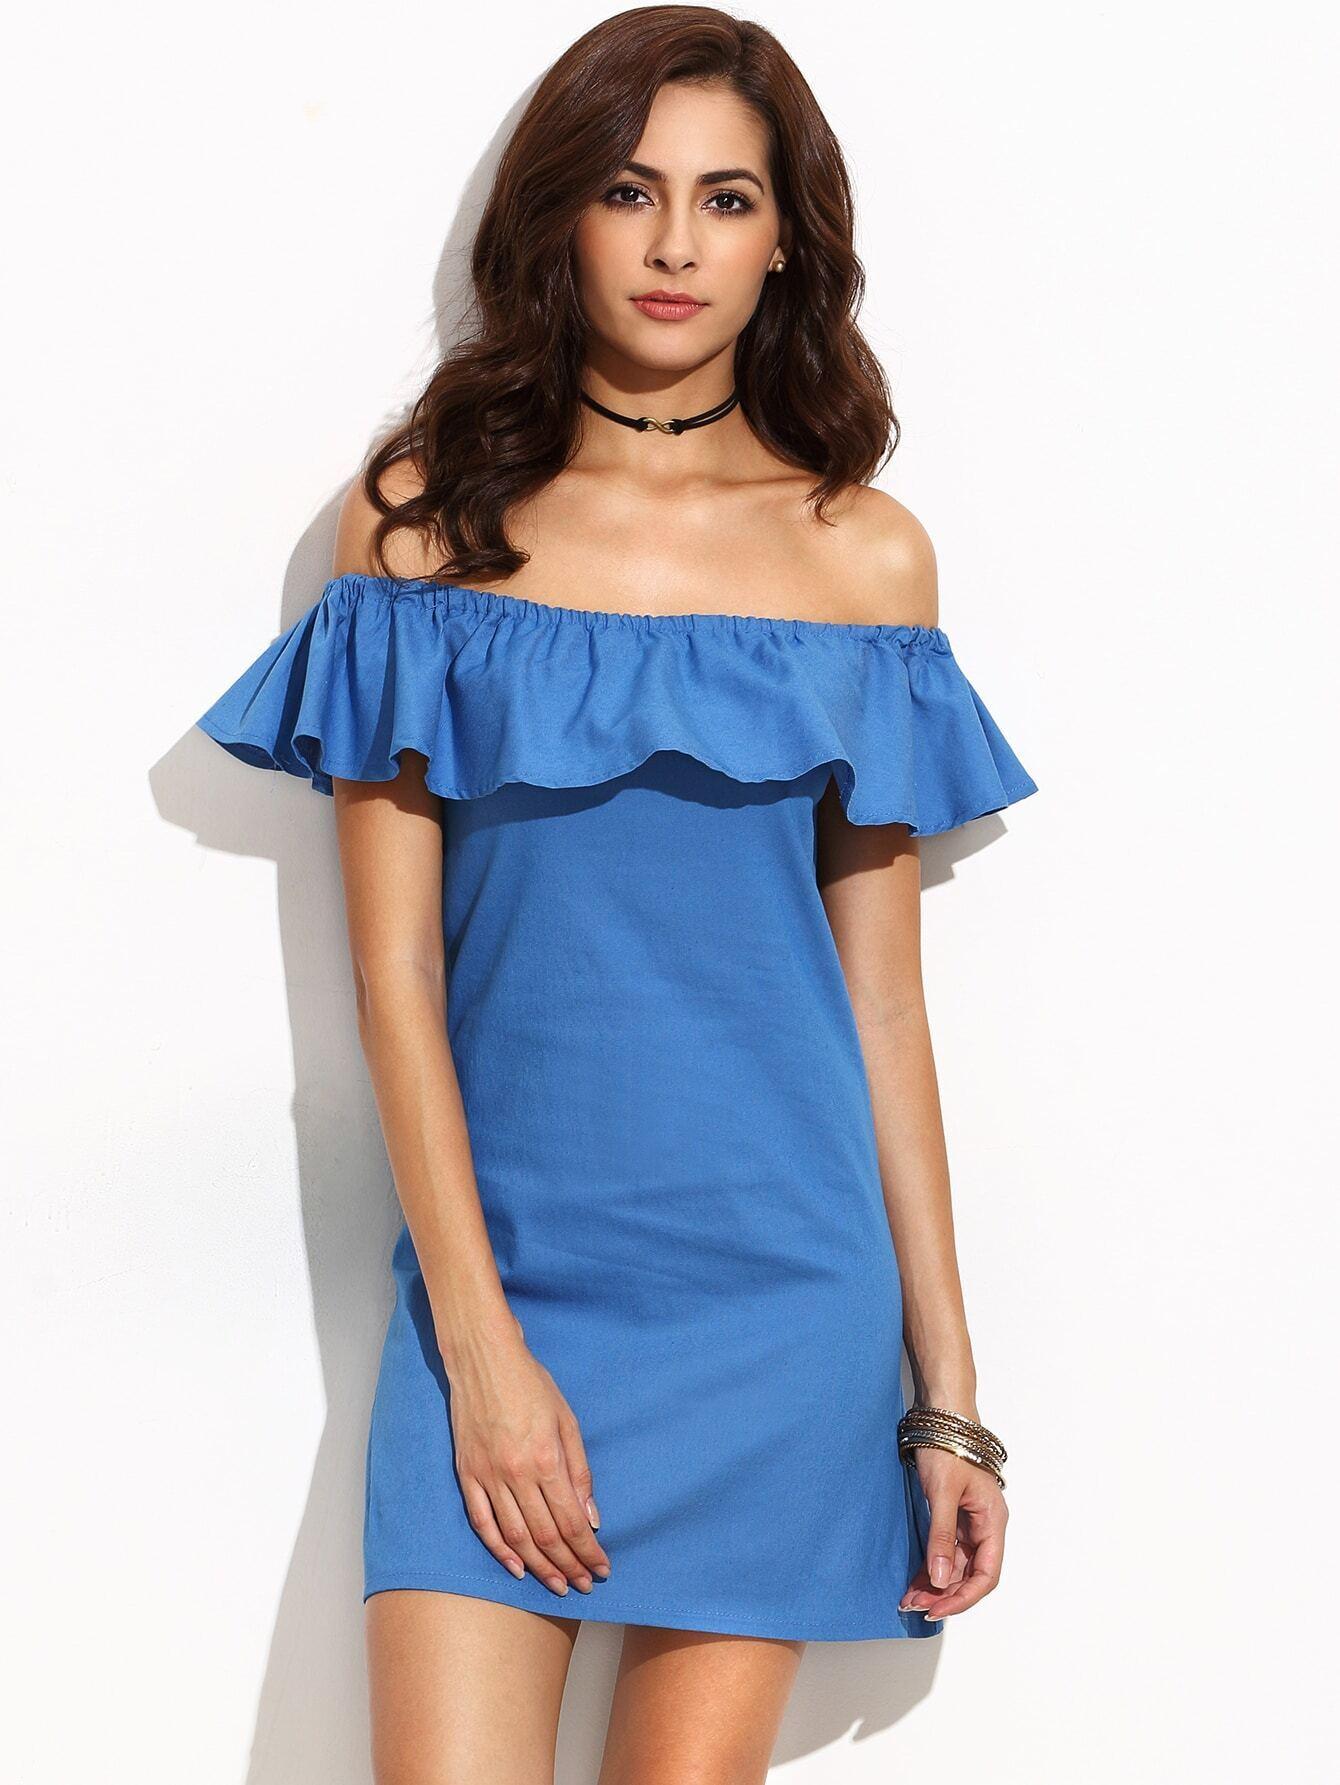 Blue Ruffle Off The Shoulder Dress EmmaCloth-Women Fast Fashion Online